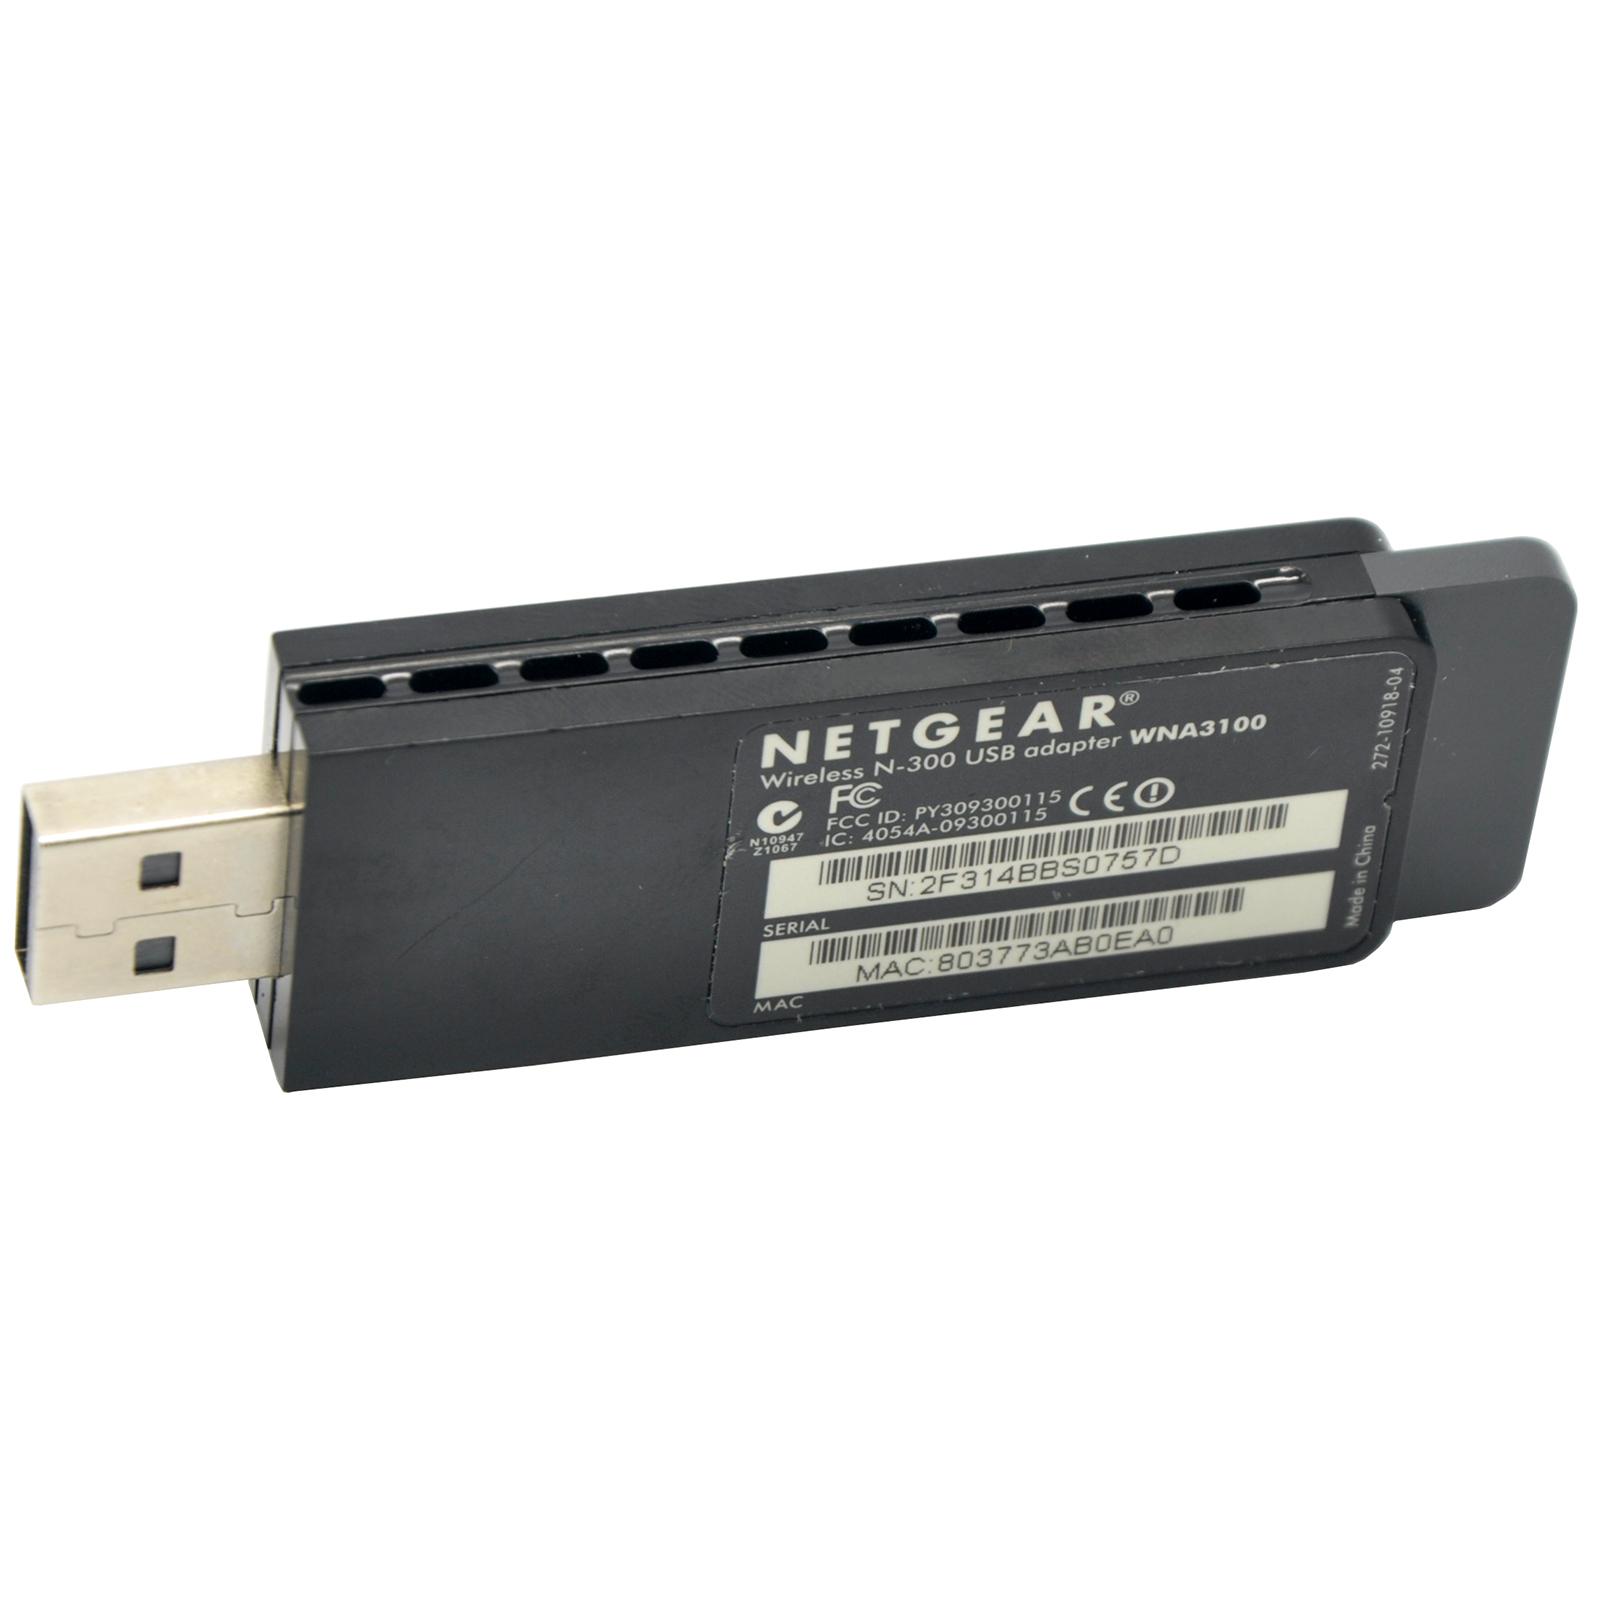 netgear wna3100 driver download windows 10